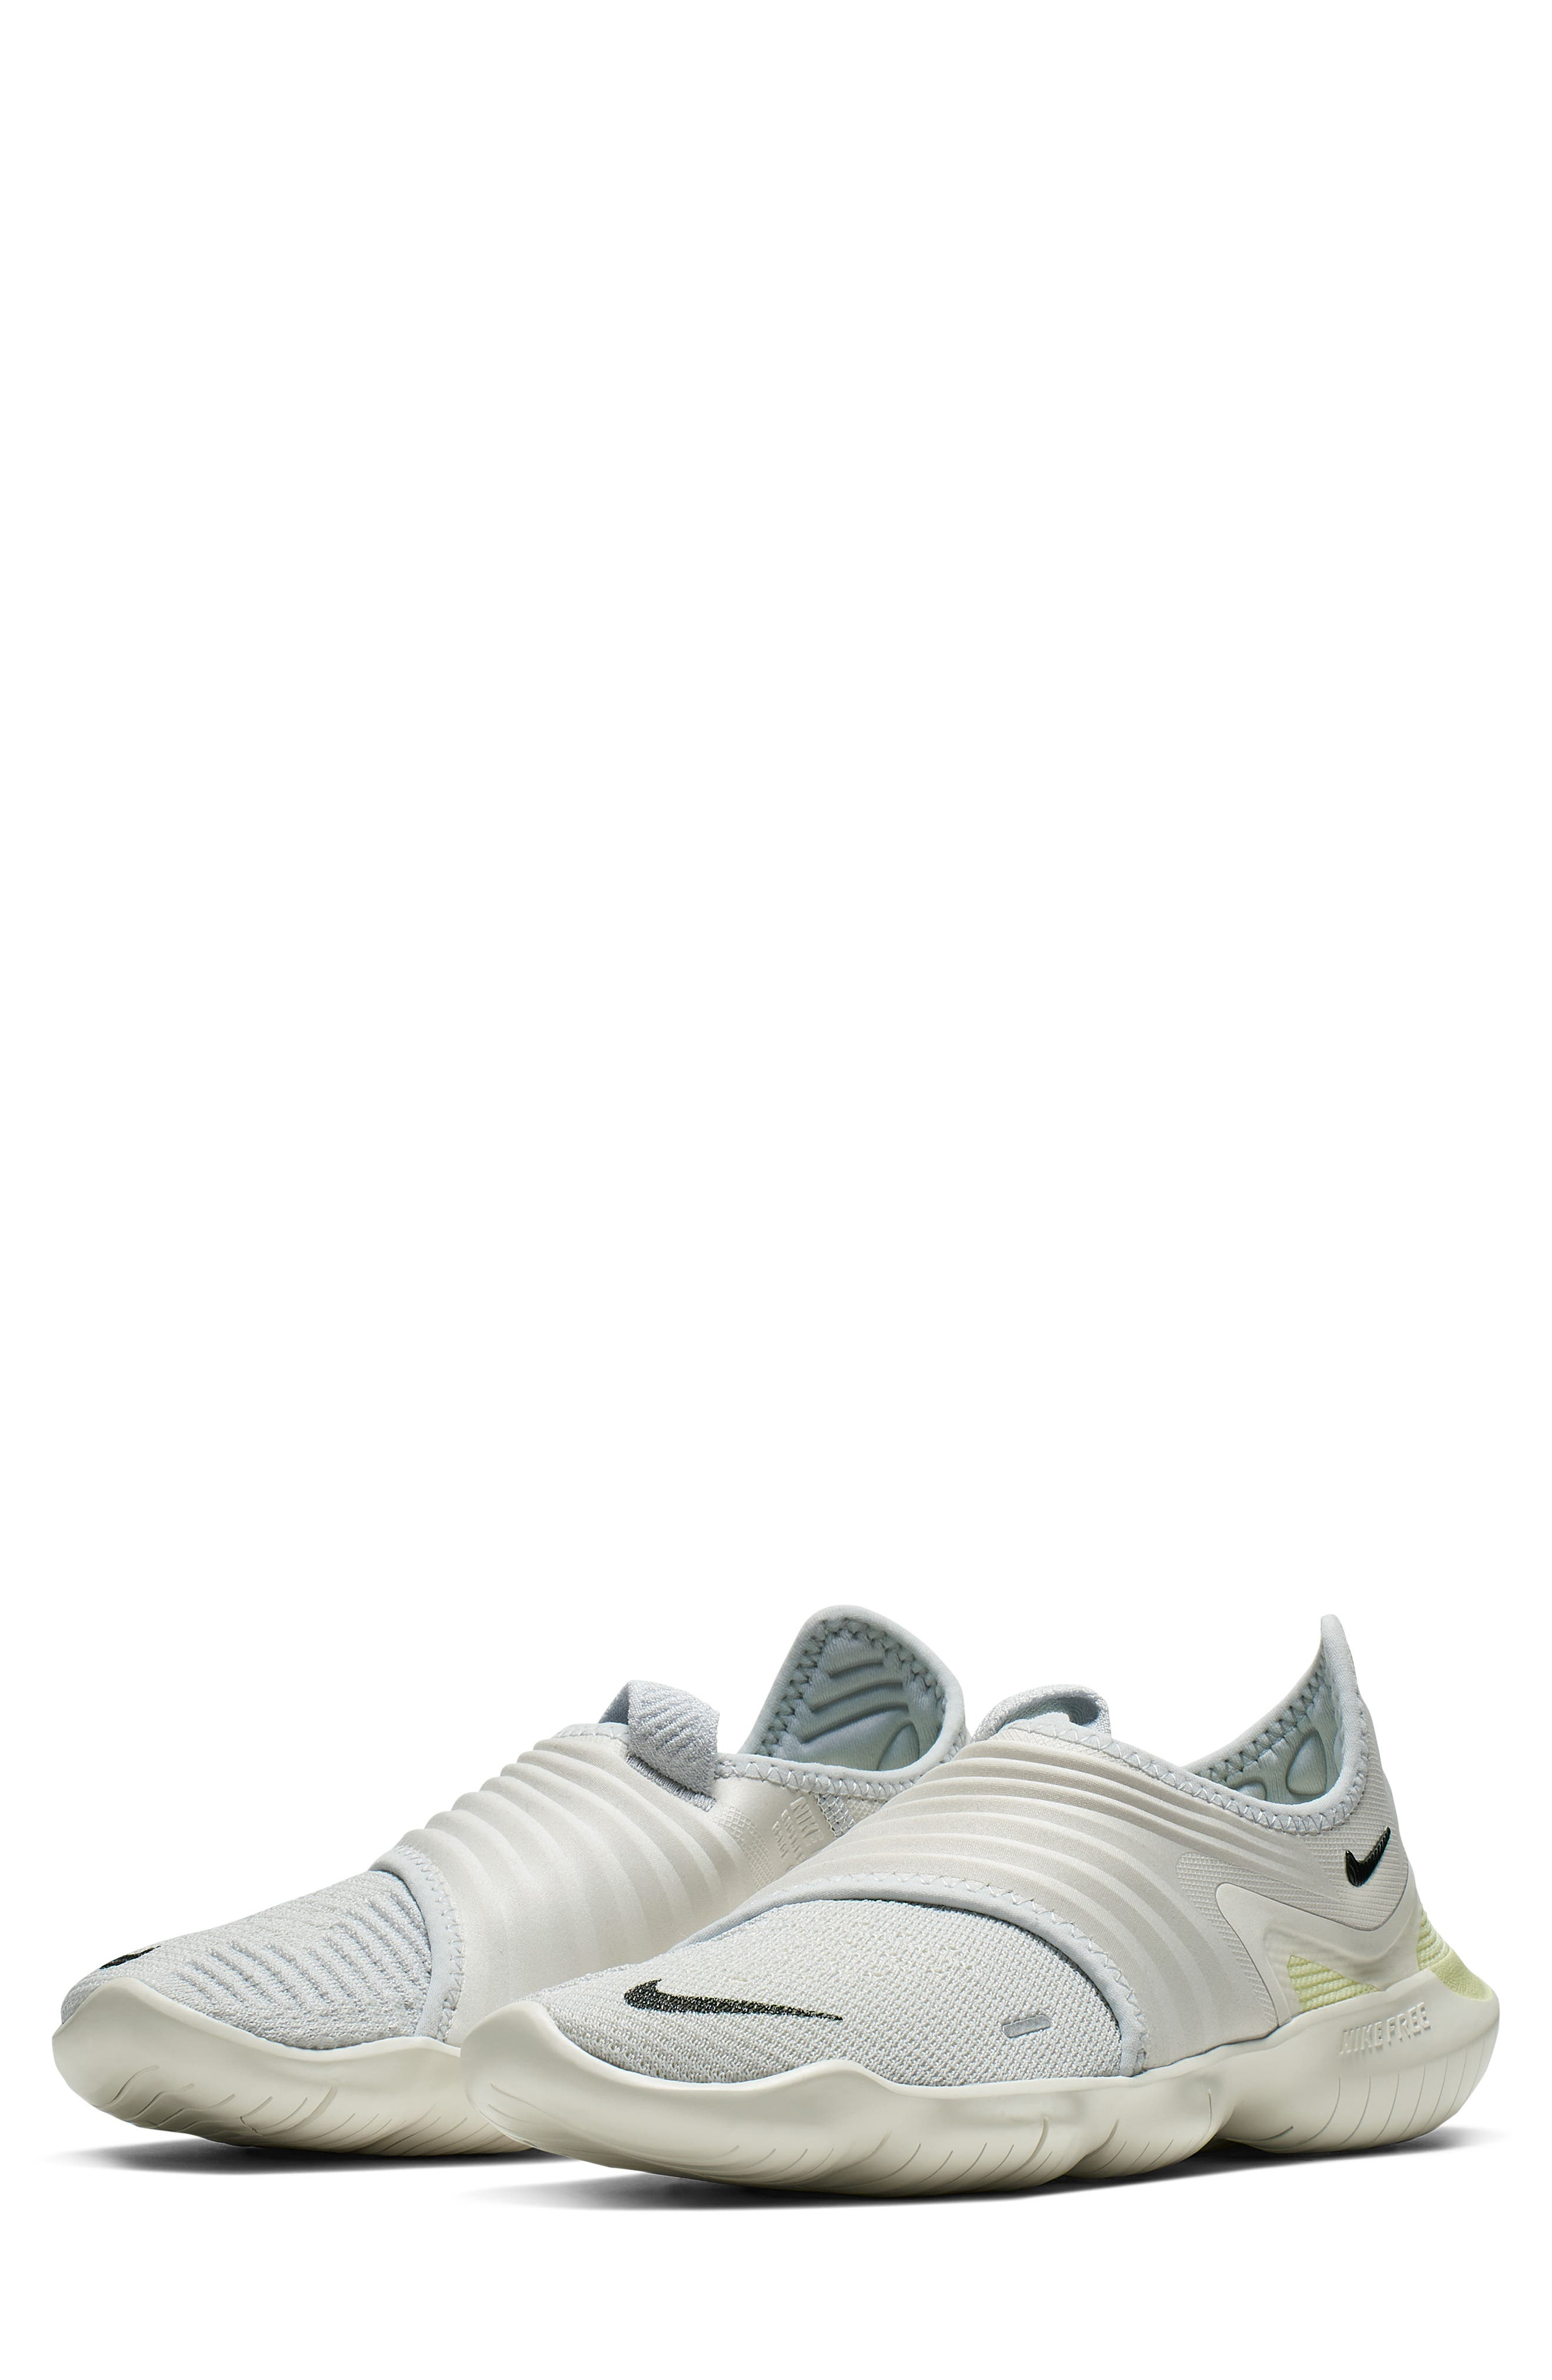 Nike Free RN Flyknit 3.0 Running Shoe